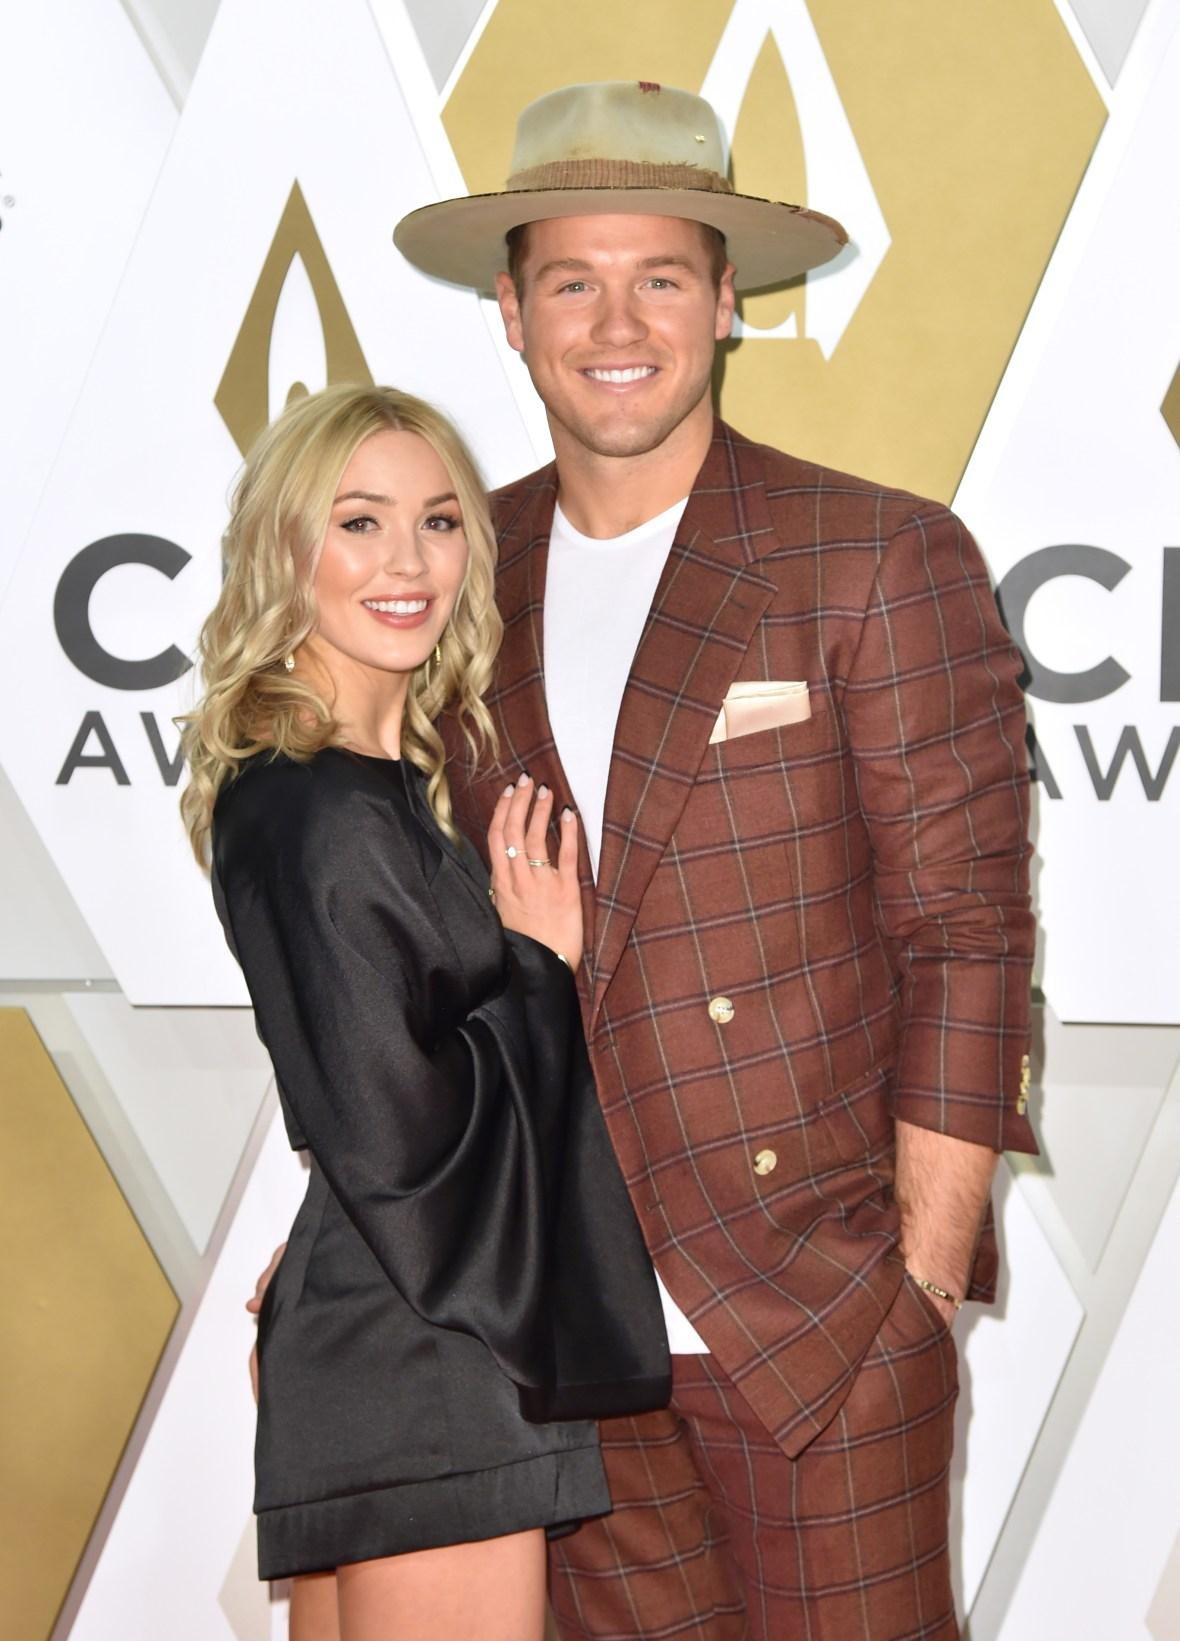 Bachelor Colton Underwood Wears Big Hat on Red Carpet With Ex Girlfriend Cassie Randolph